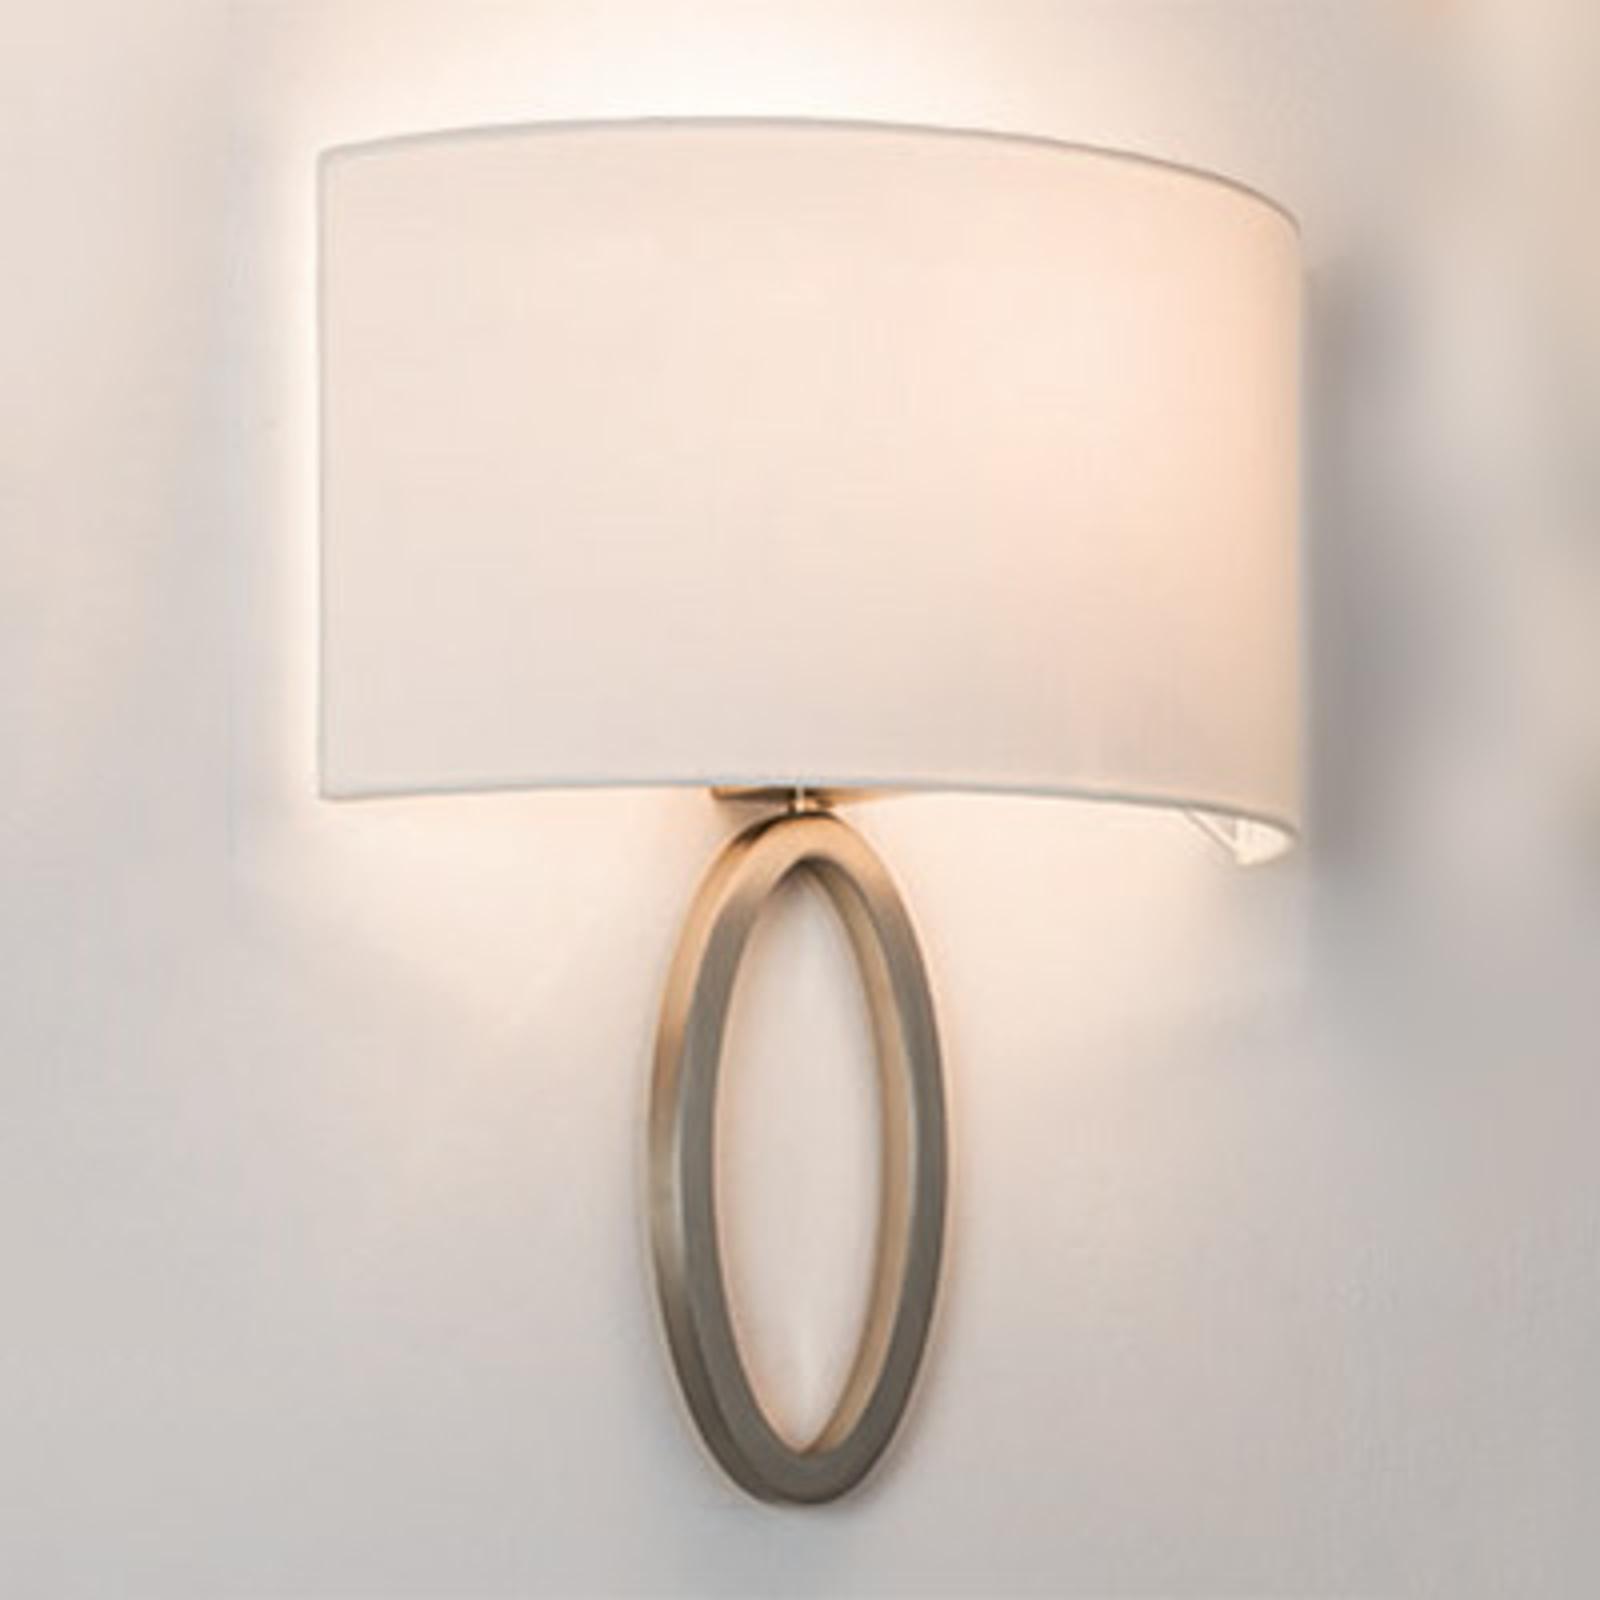 Astro Lima textilné nástenné svietidlo biele/nikel_1020521_1